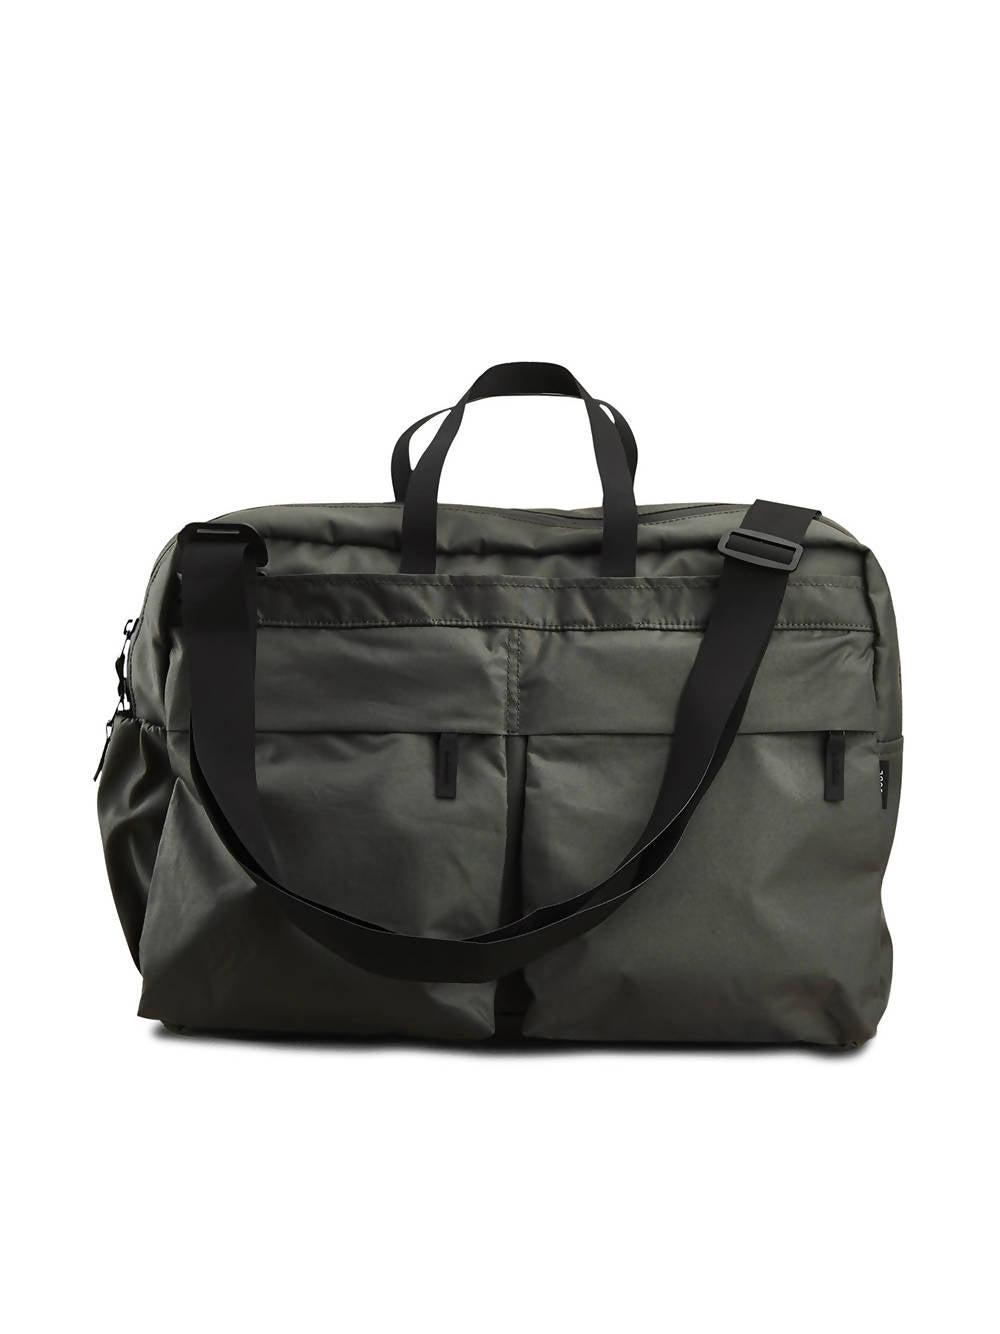 PSSBL THE COURIER BAG DUSTY BLACK